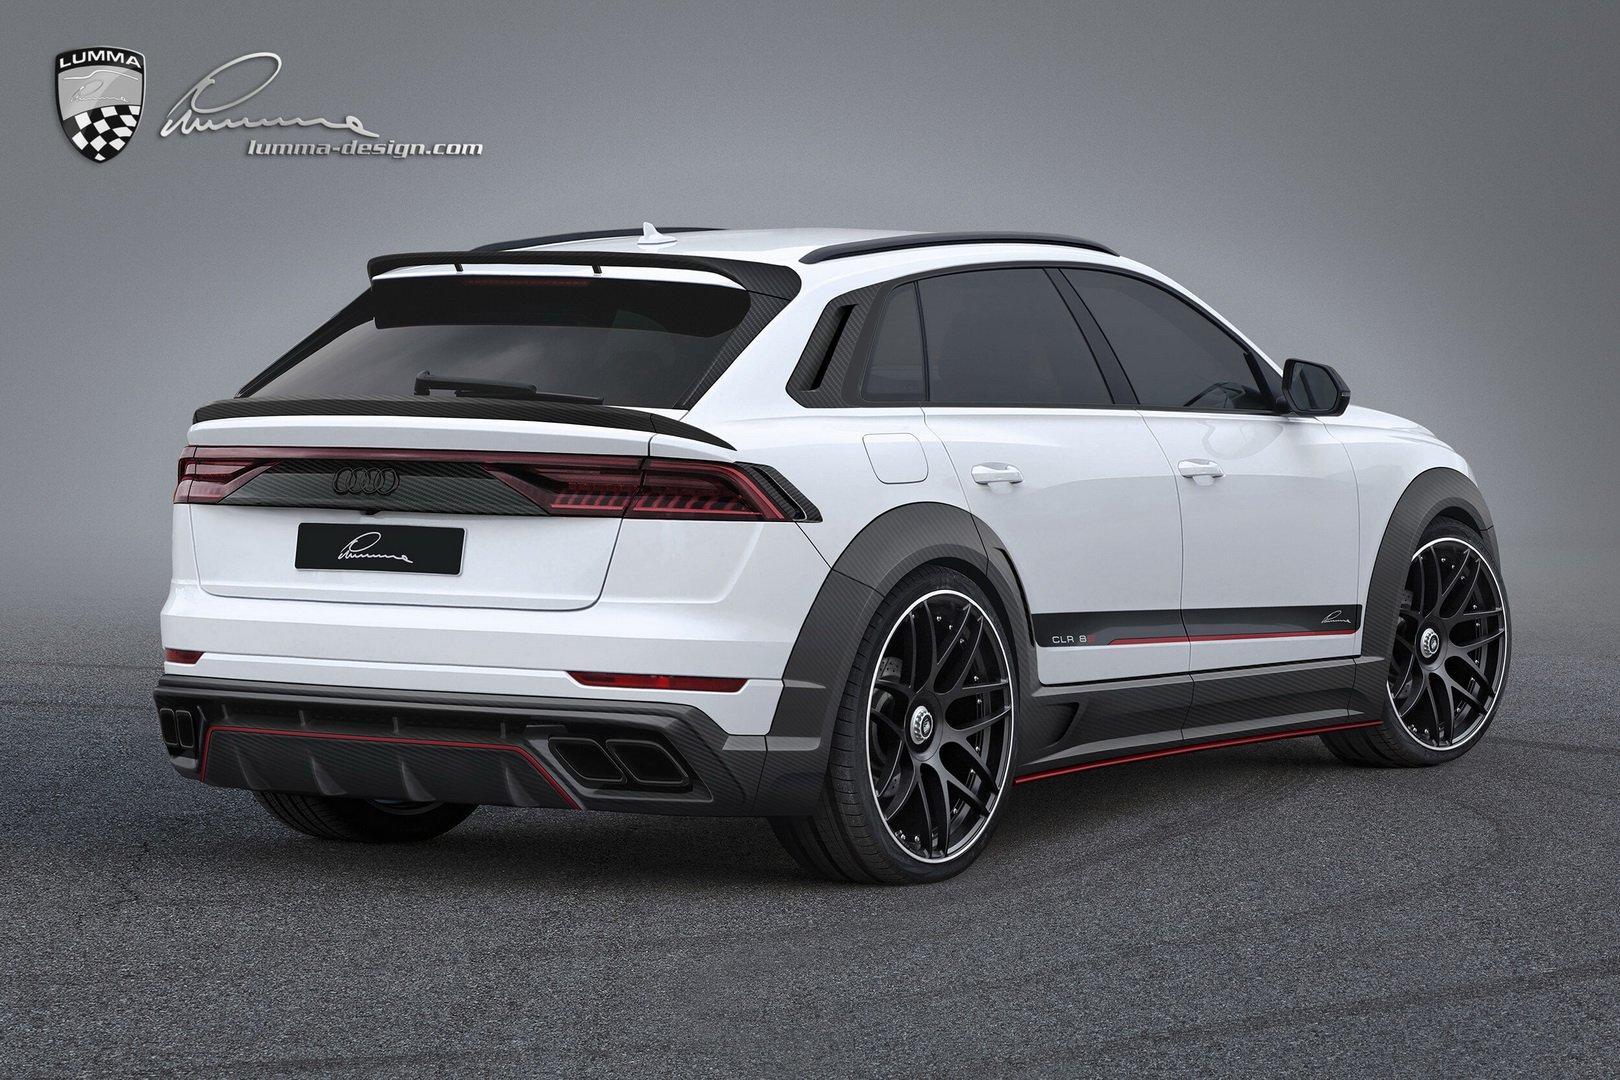 Audi Q8 de la Lumma Design - Audi Q8 de la Lumma Design